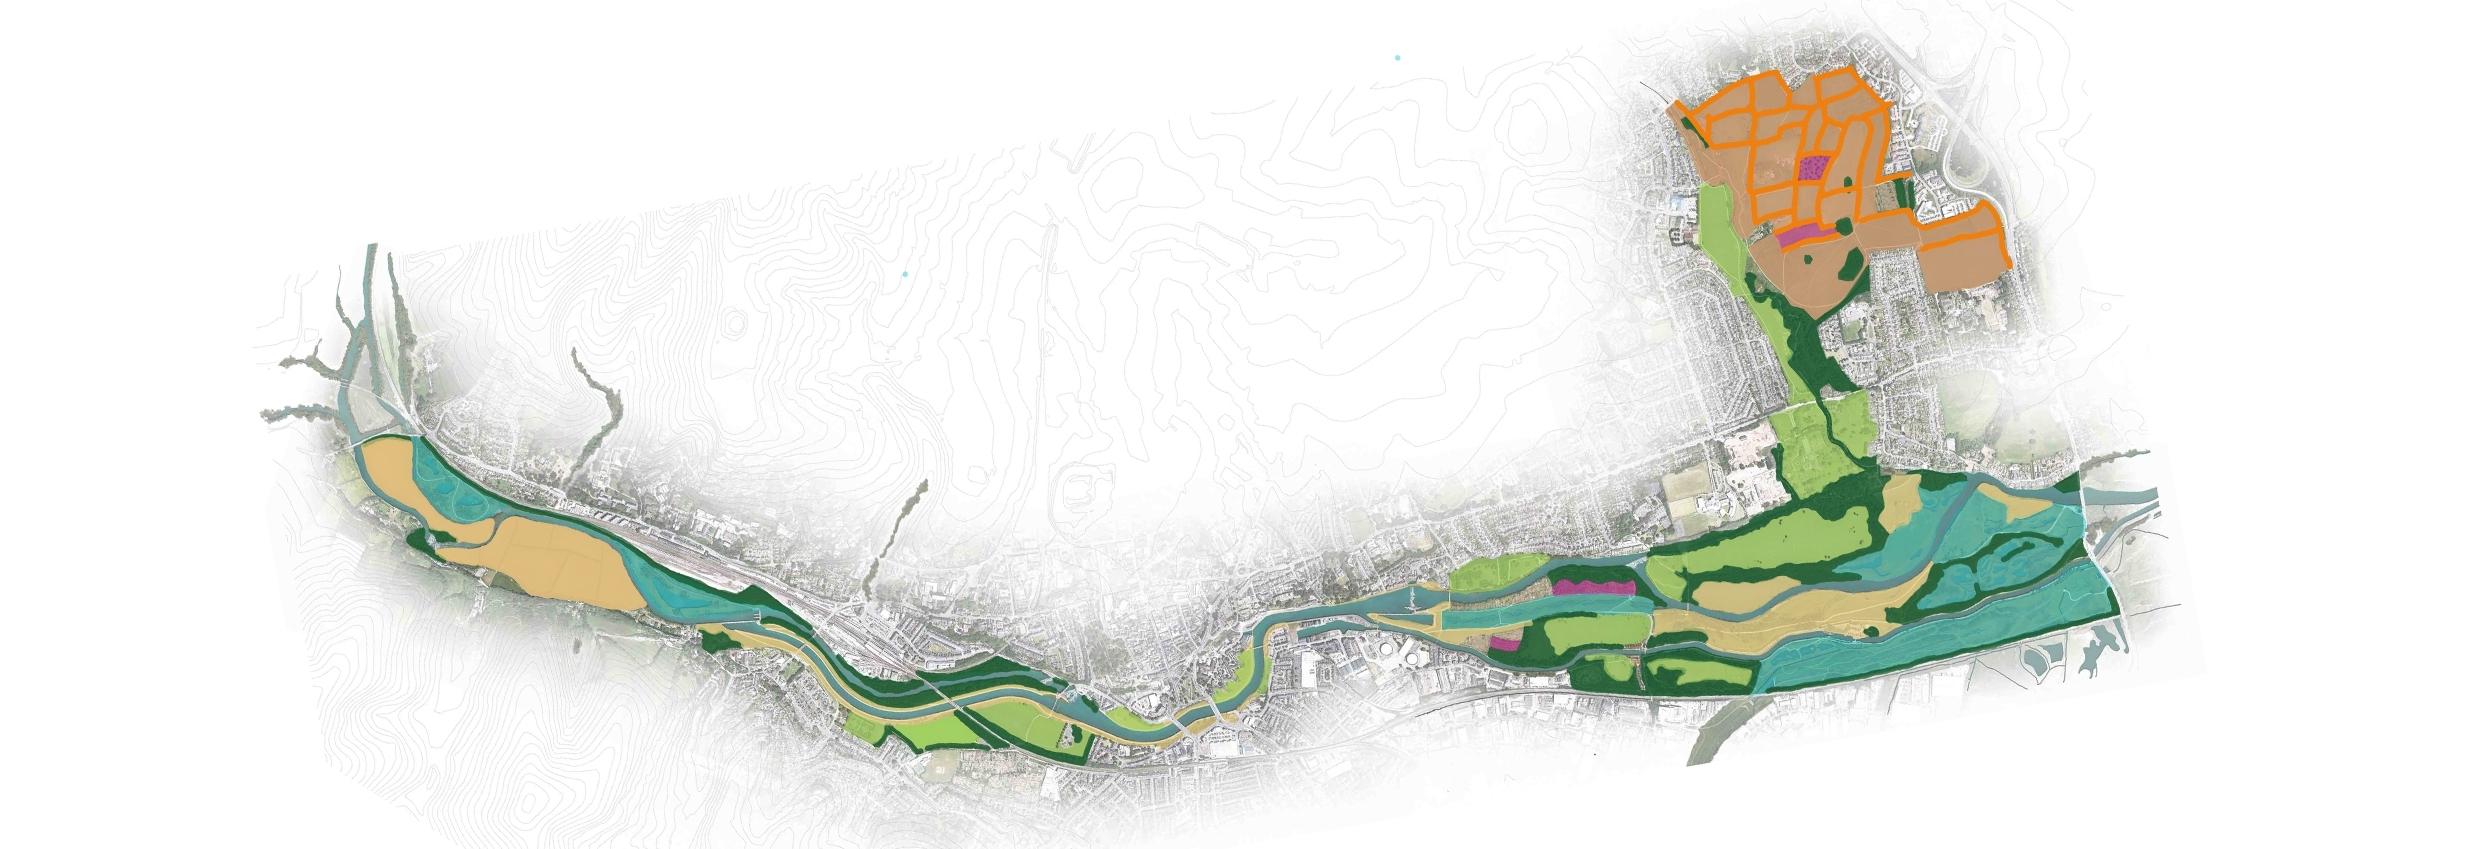 Masterplan_Habitat strategy.jpg